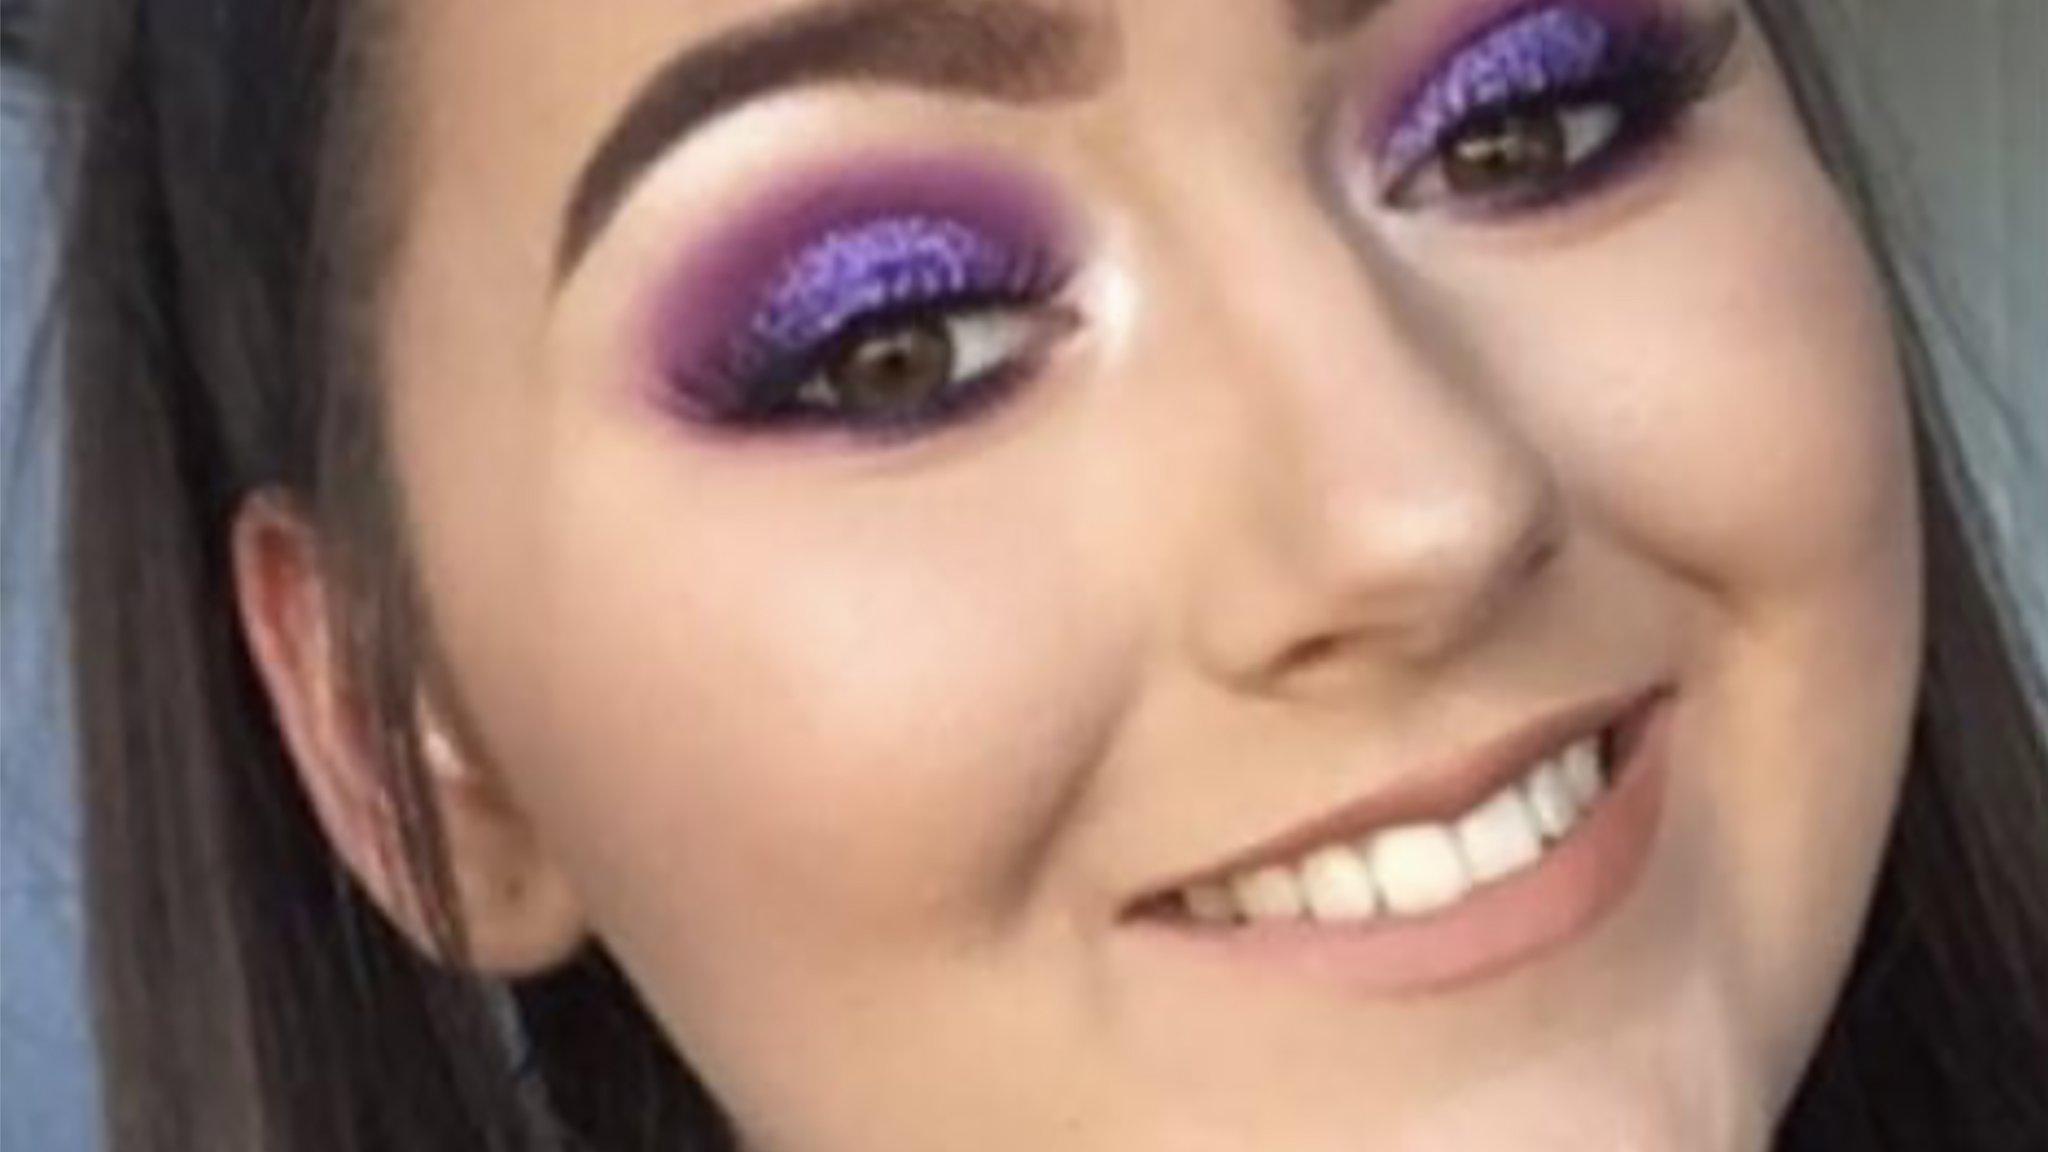 Lauren Bullock 'had such a unique smile'